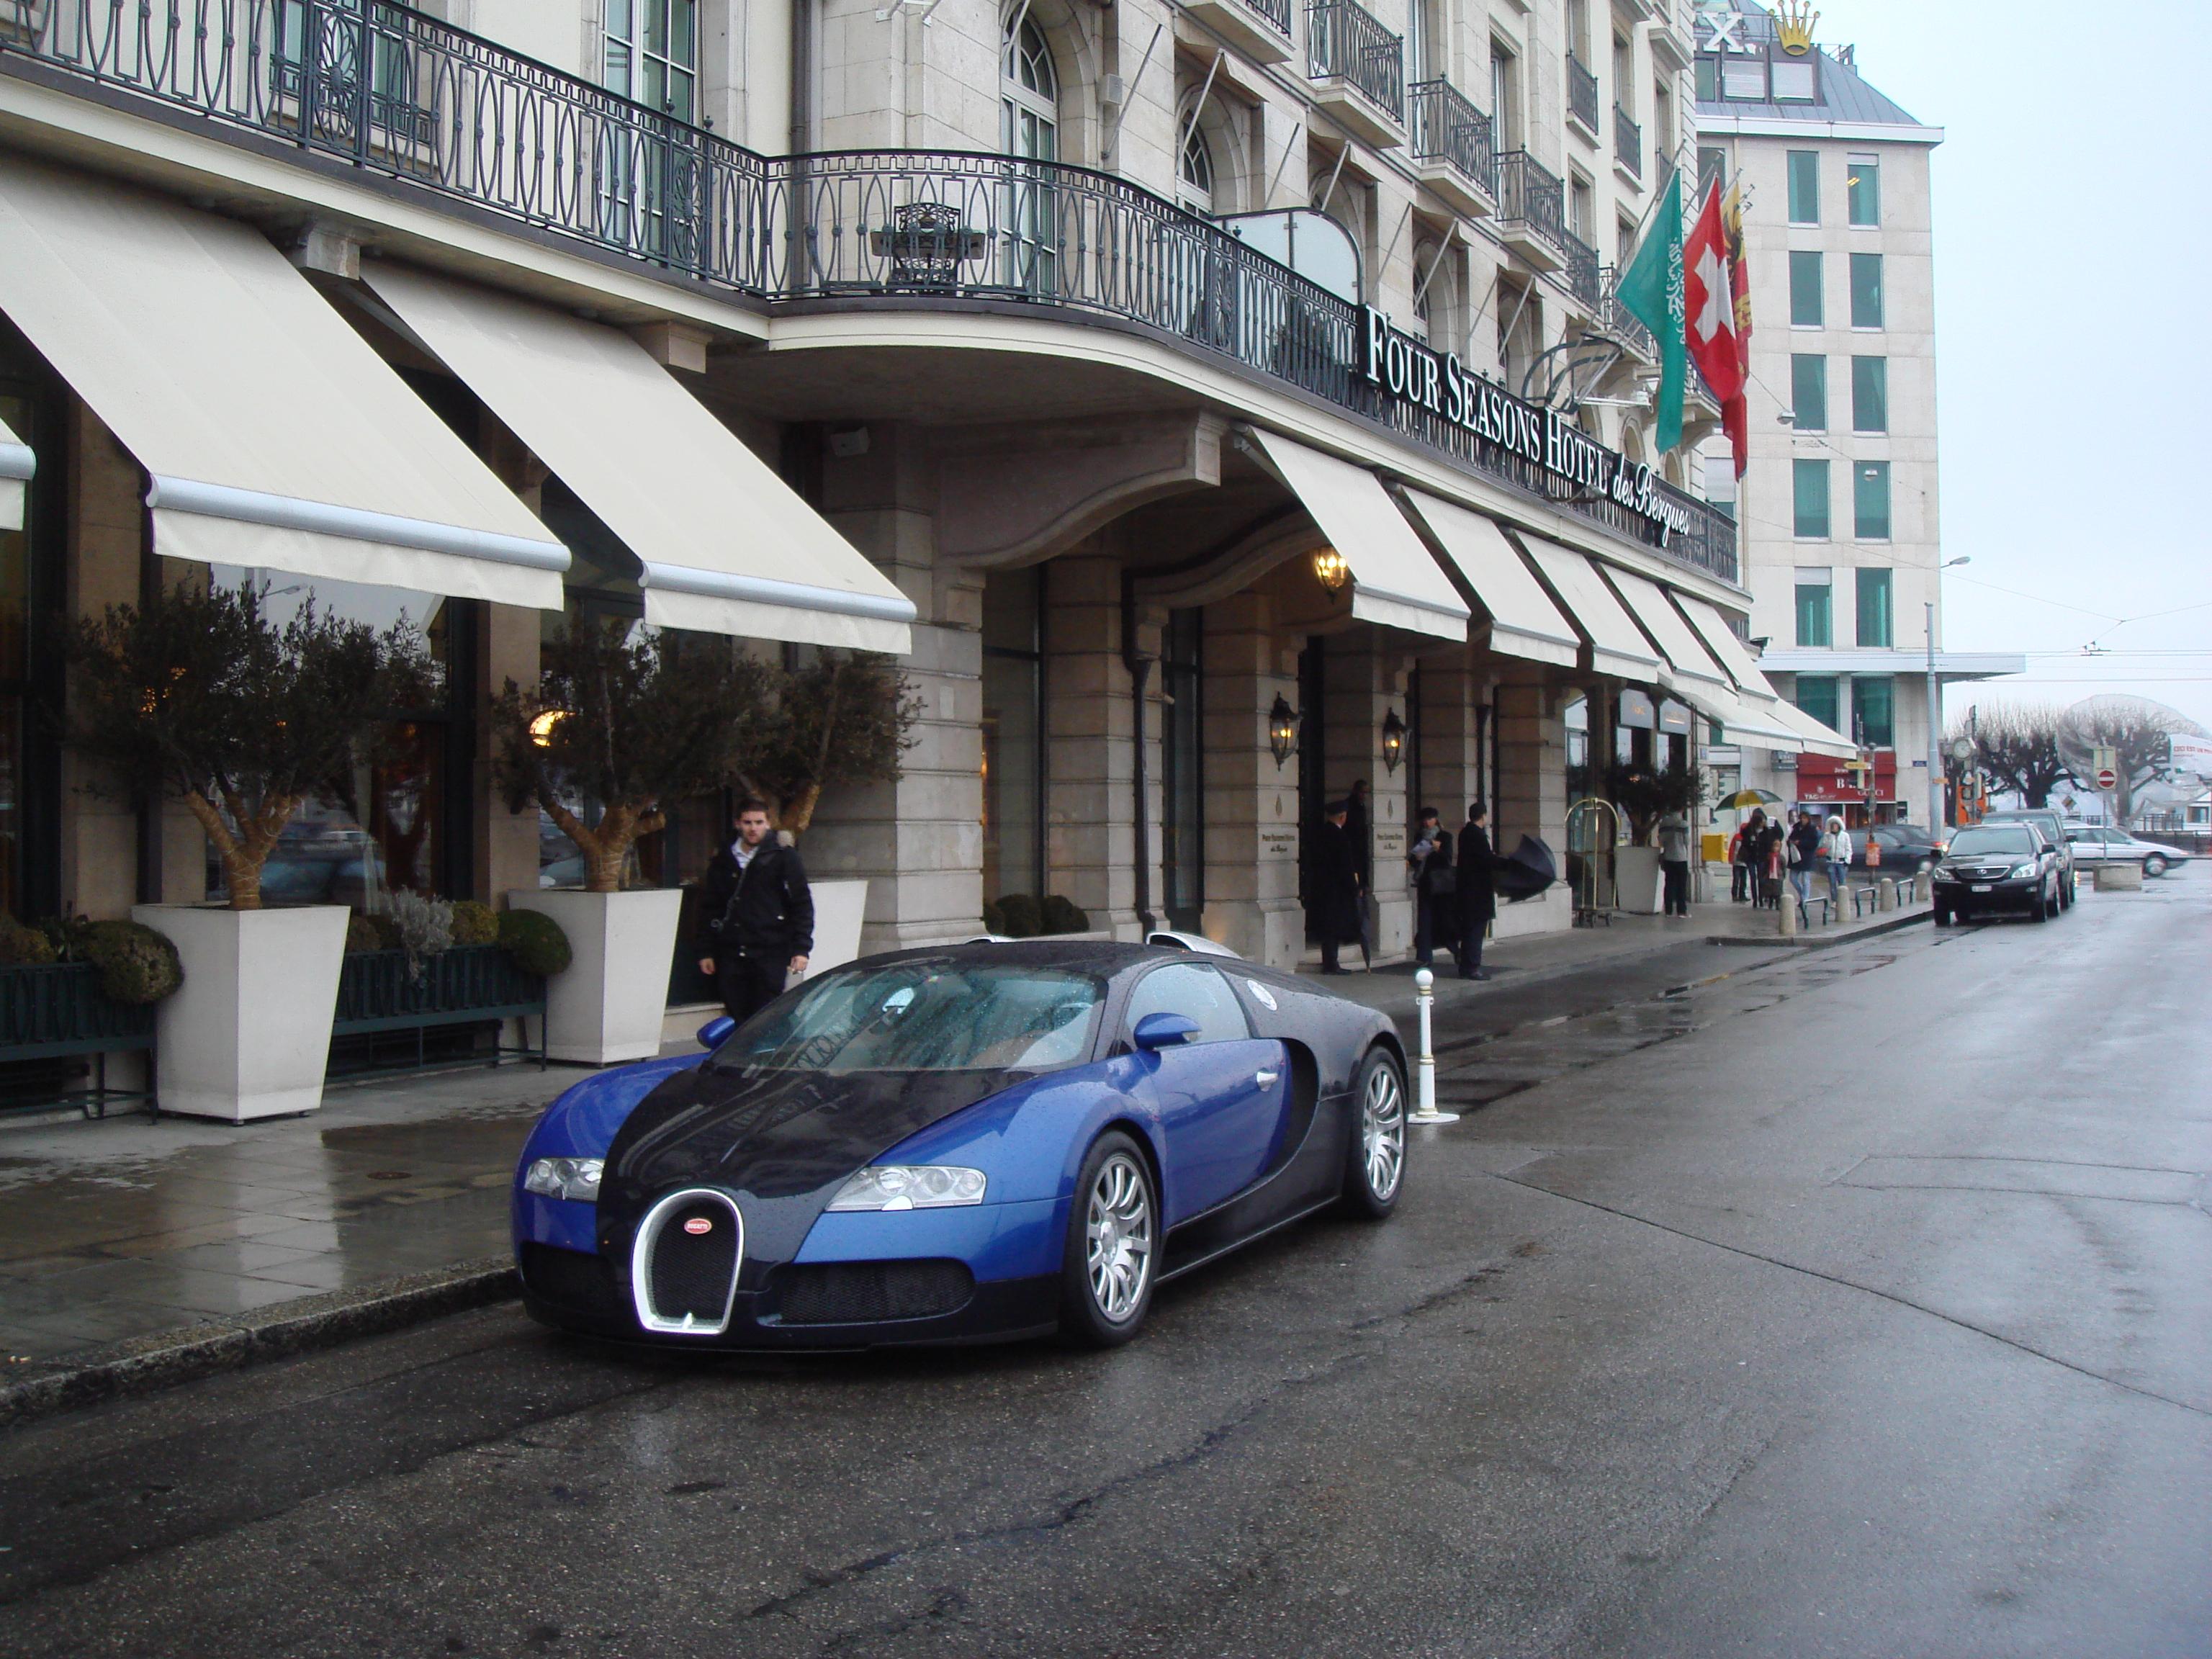 http://www.m5board.com/vbulletin/attachments/gtboard-com-general-sportscars/79678d1236729562-spotted-bugatti-veyron-geneva-outside-four-seasons-dsc00164.jpg